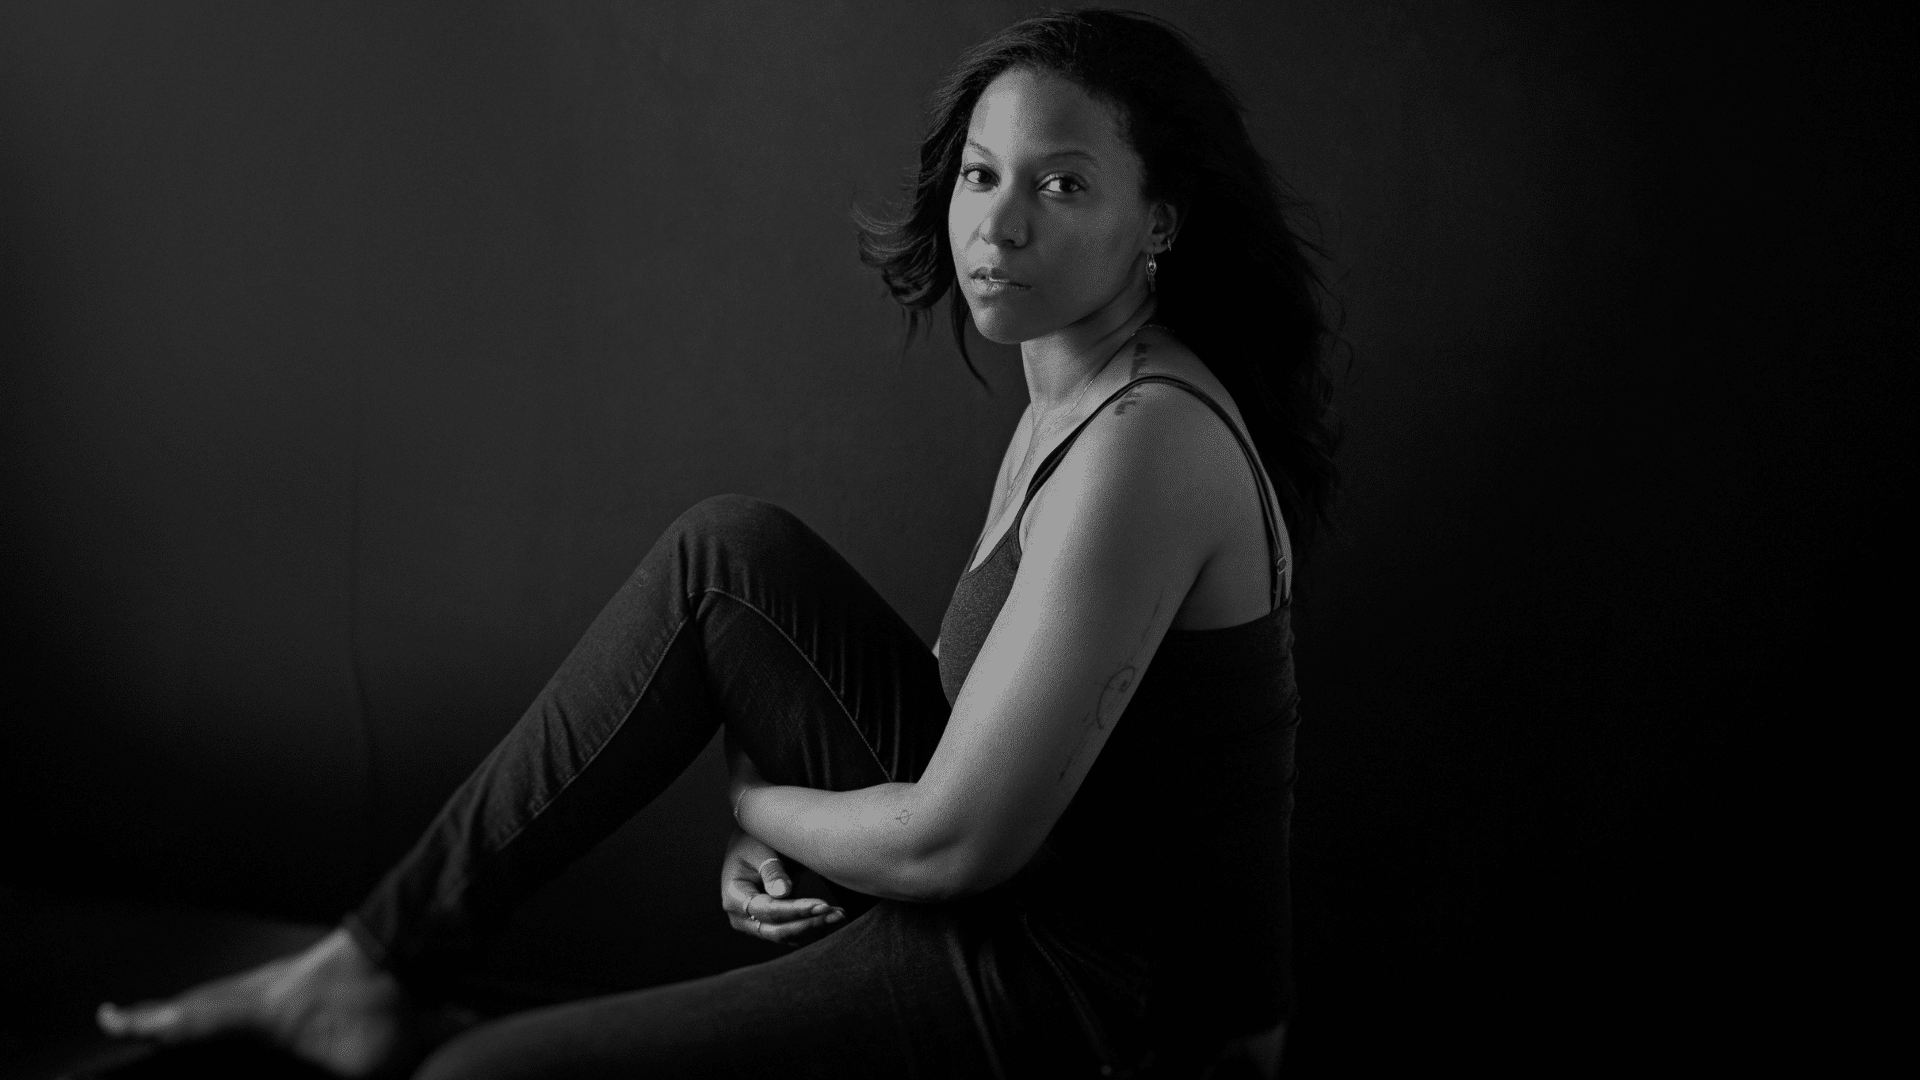 real women portrait photography